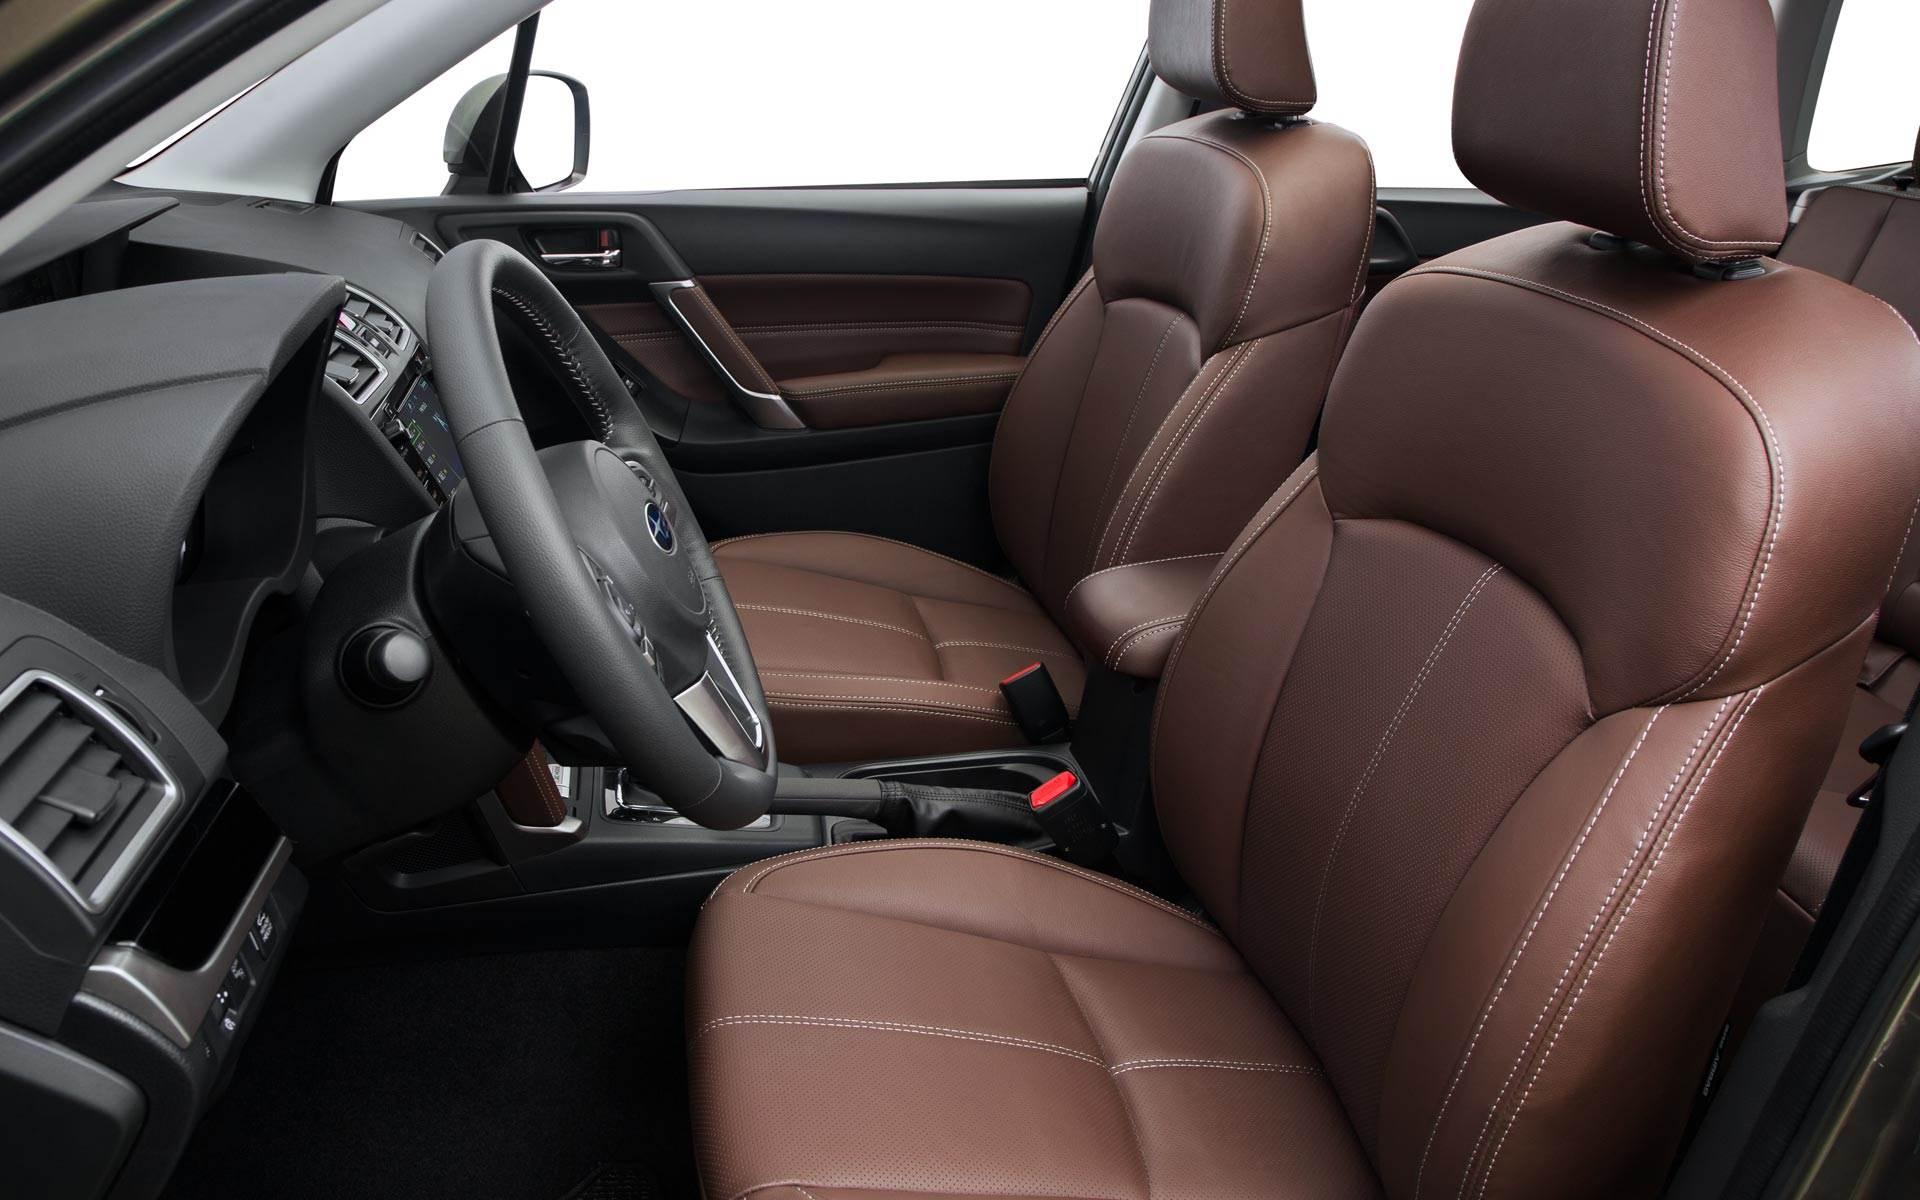 New Subaru Forester Interior Features